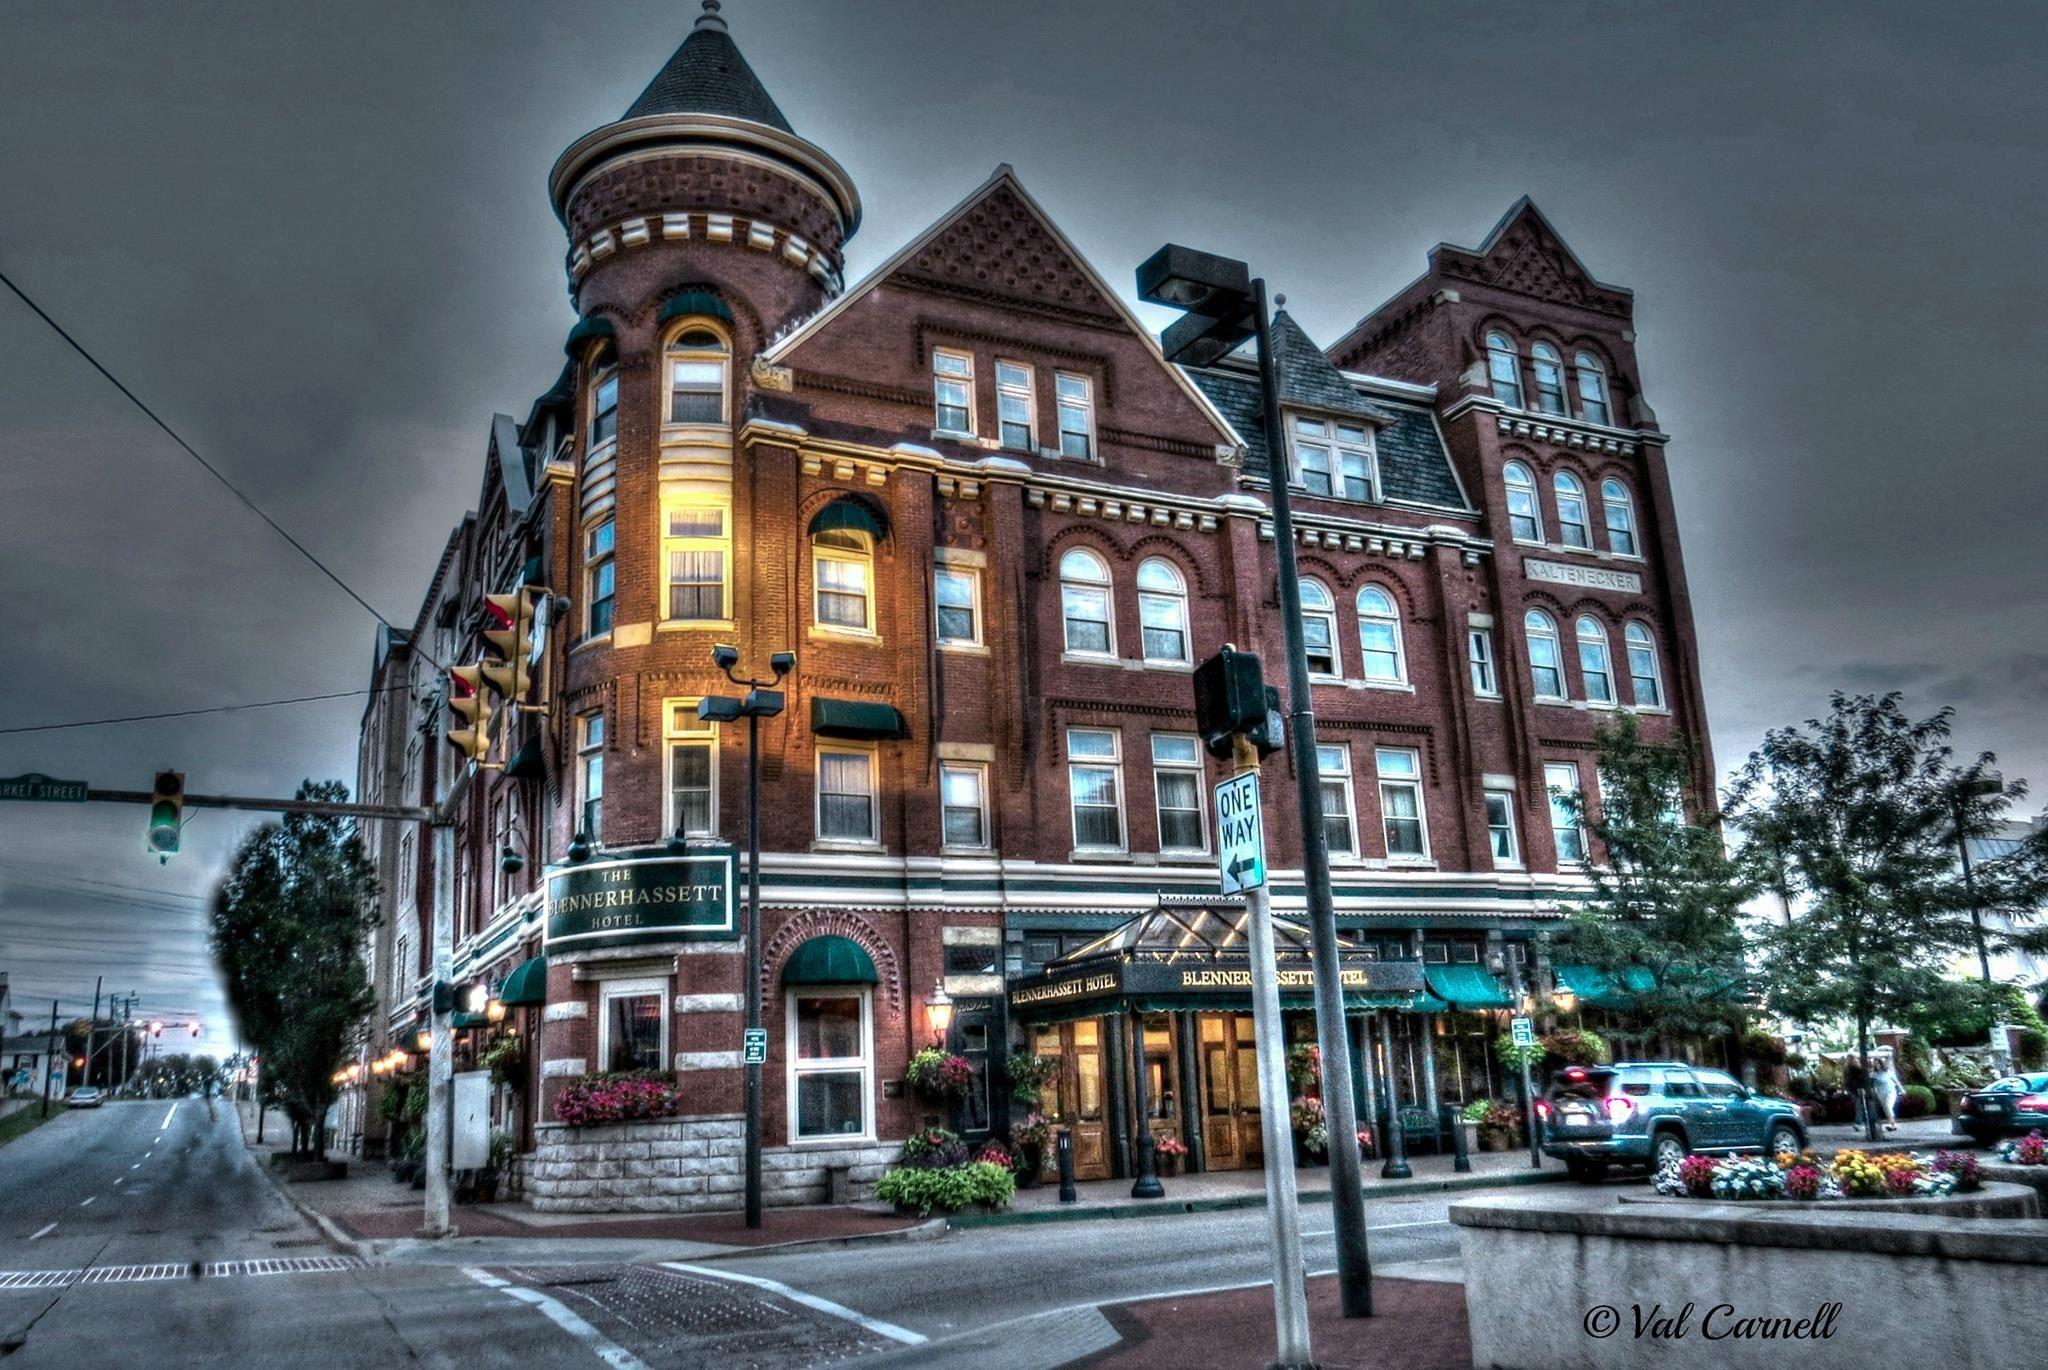 Parkersburg Wv The Blennerhett Hotel Built In 1889 Reported To Be